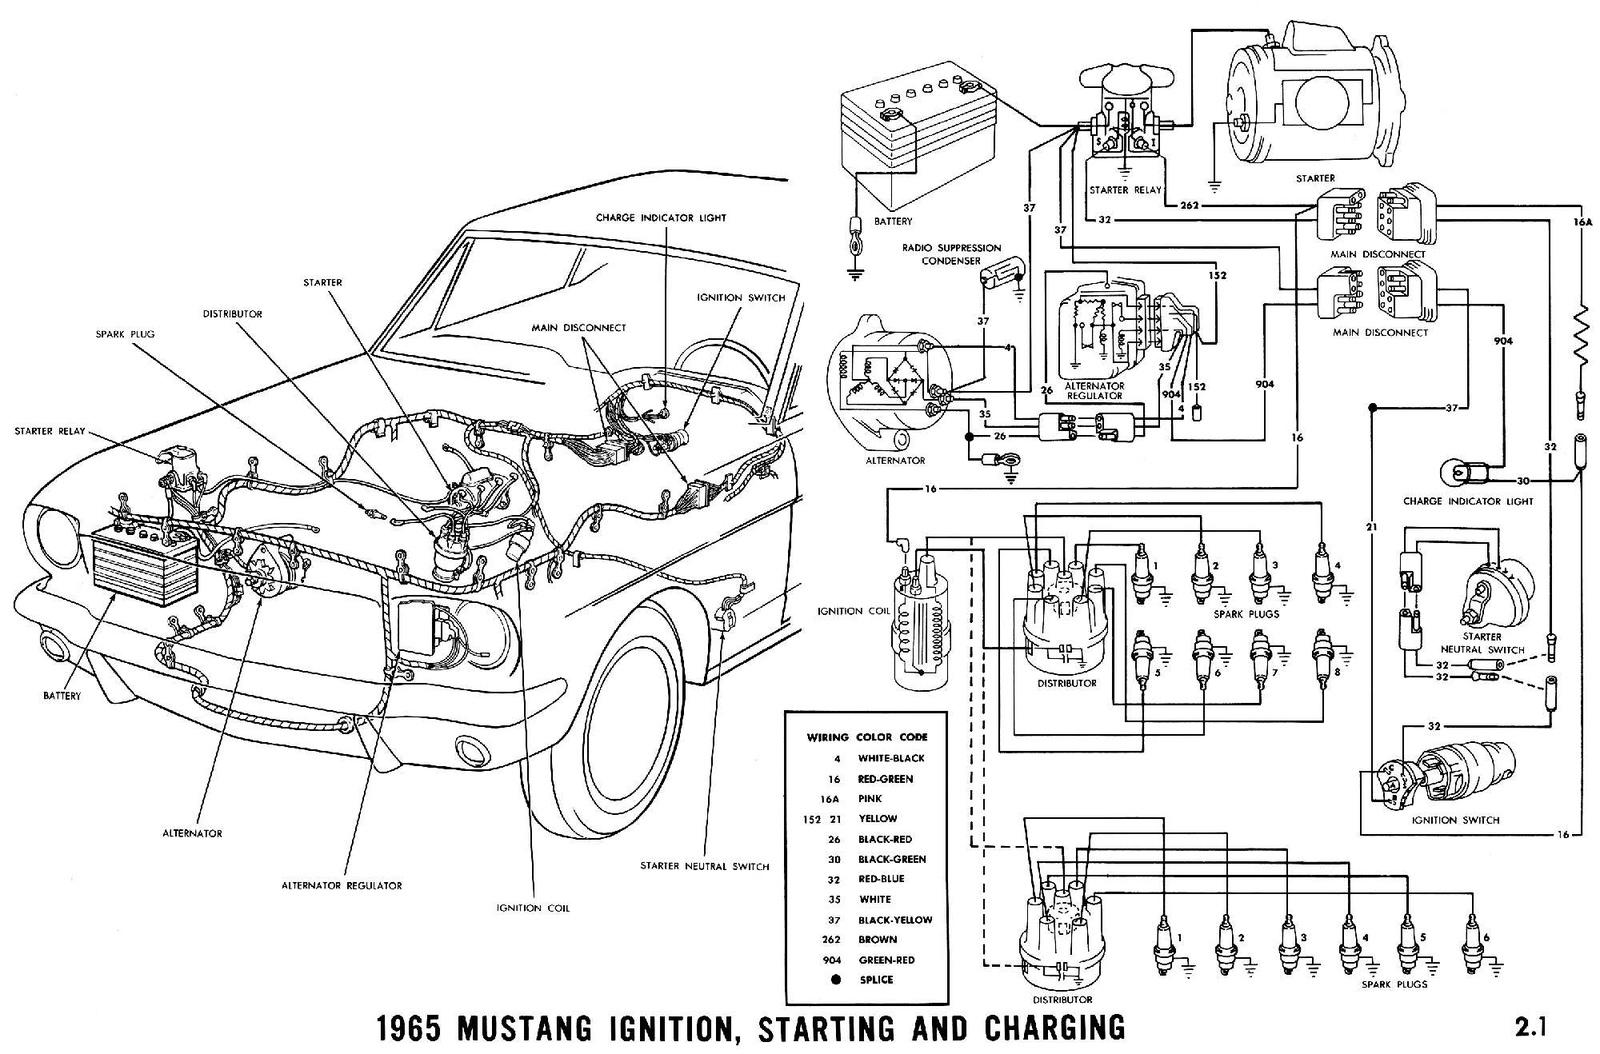 Electric Choke Wiring Diagram Webber